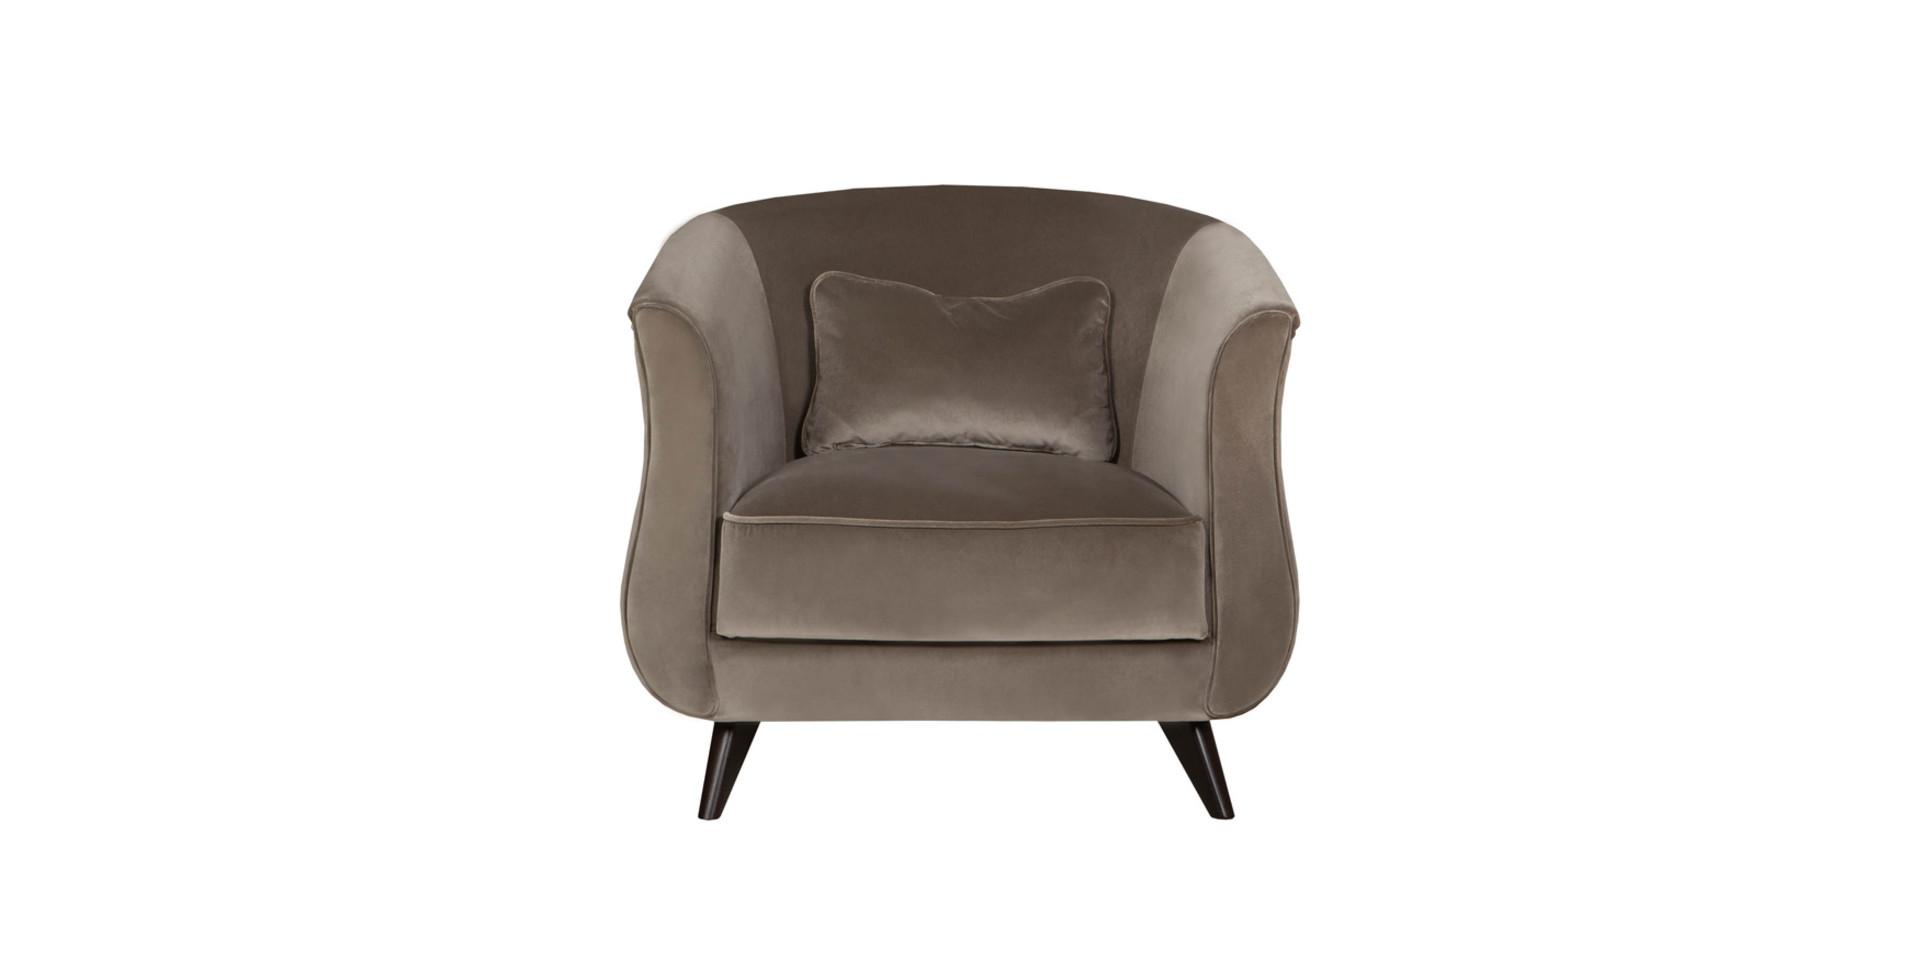 KAJSA_armchair_classic_velvet2_potato_1